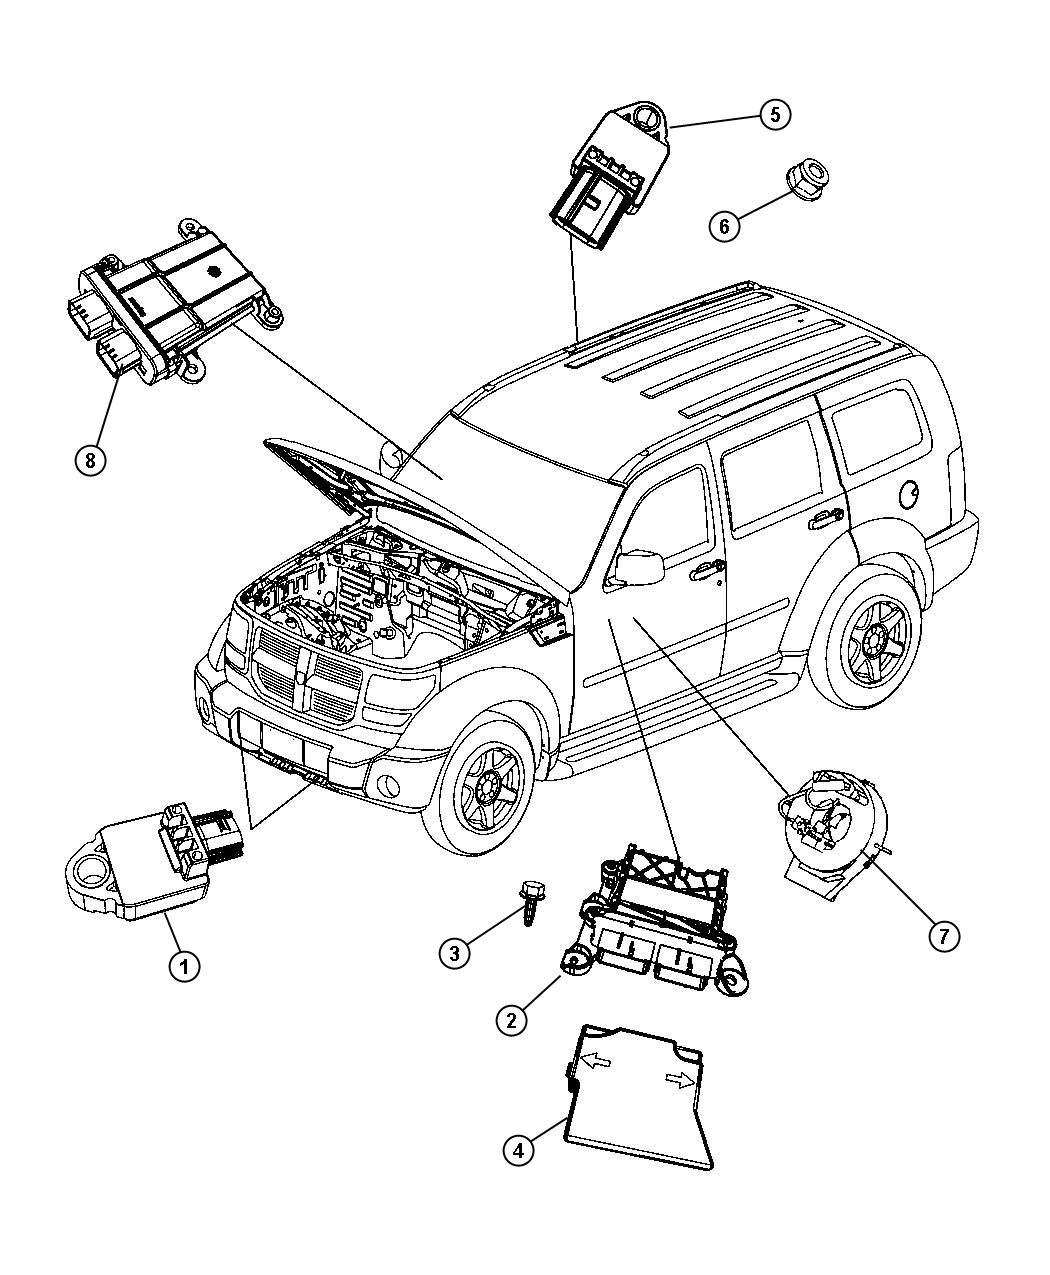 Jeep Liberty Tail Light Wiring Diagram